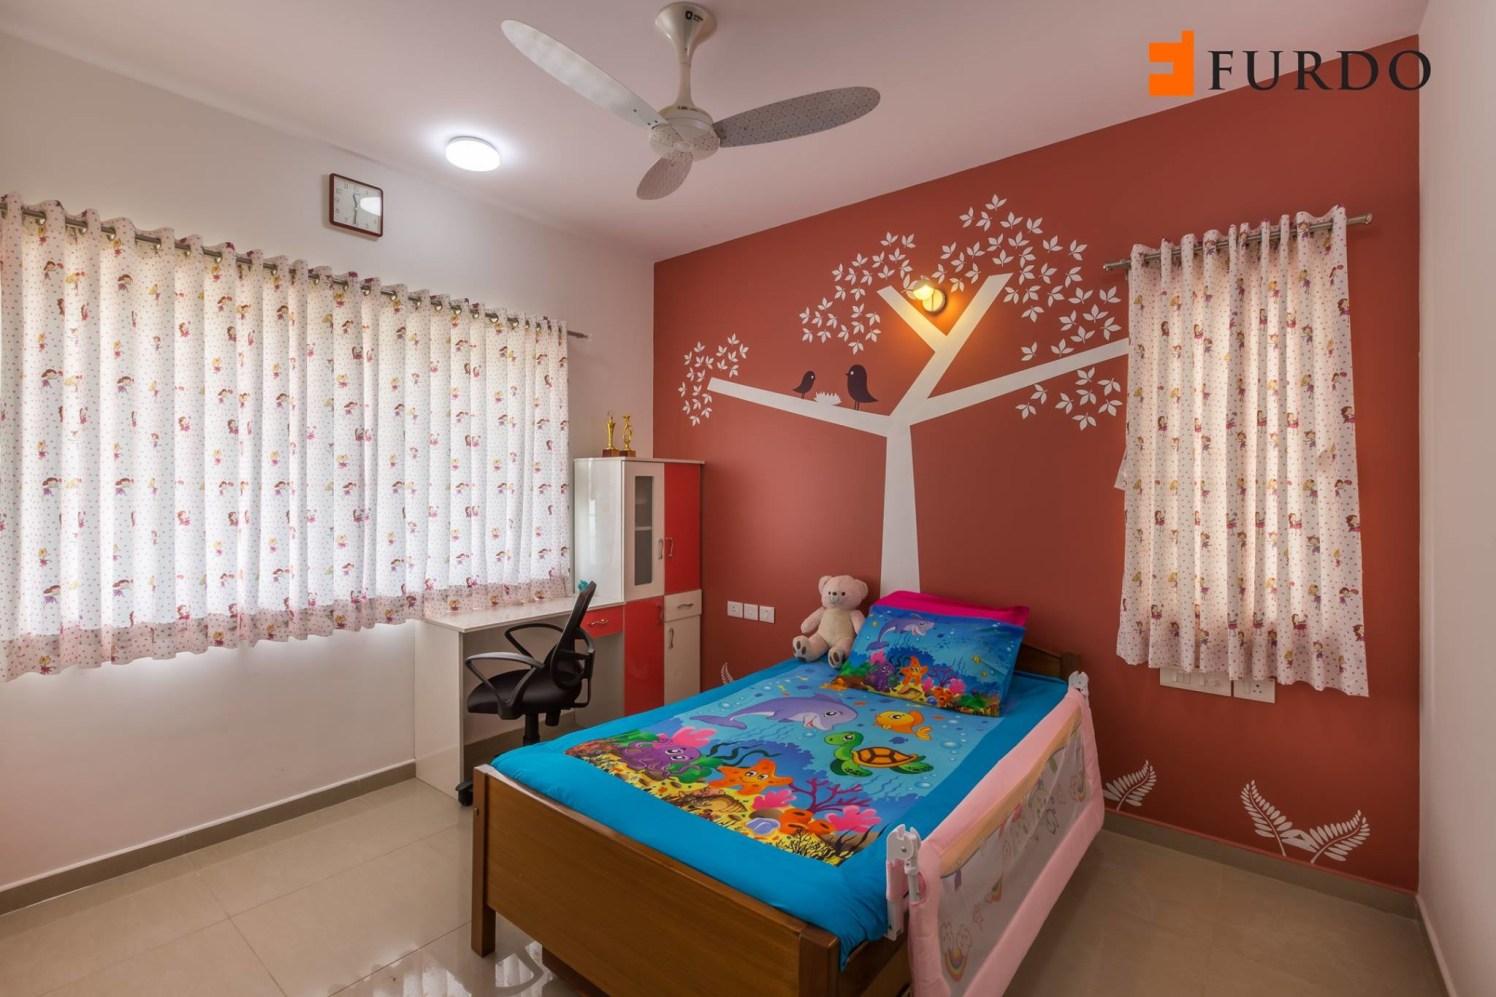 Kid's Bedroom With Red Wall Art by Furdo.com Bedroom Modern | Interior Design Photos & Ideas